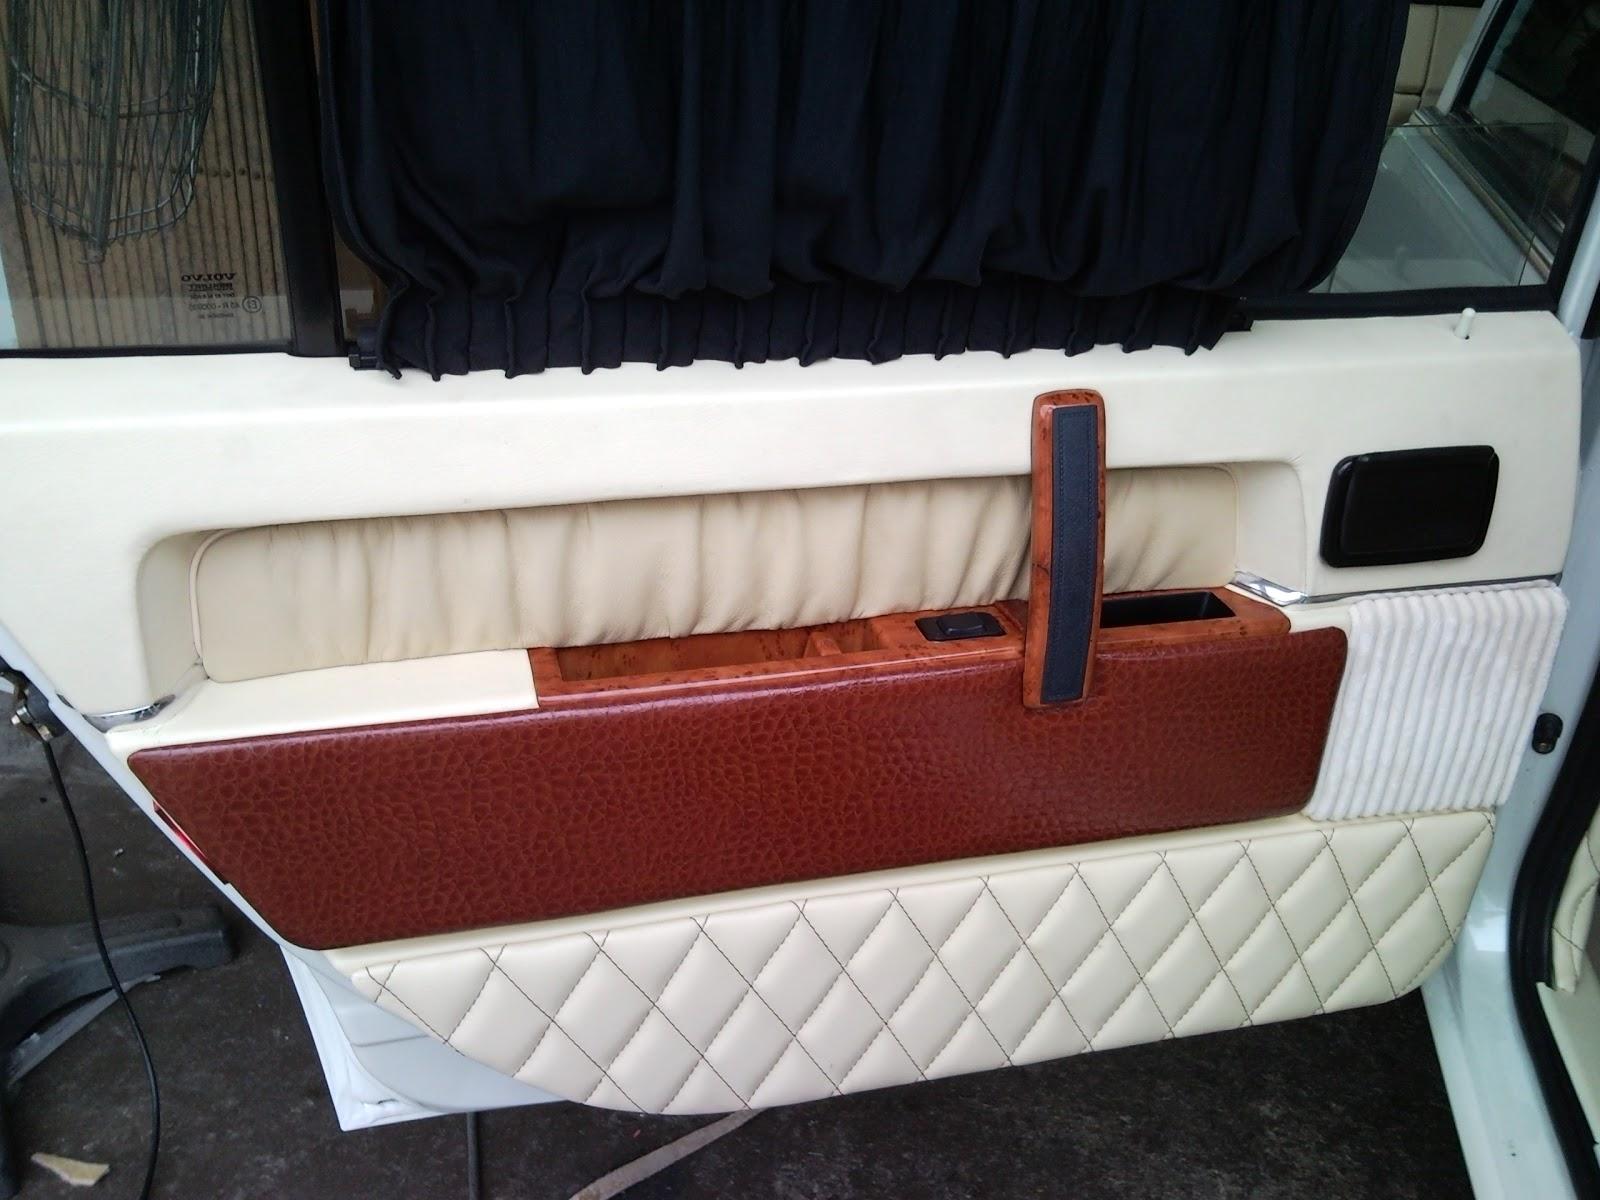 Then Leather Vip Seat Leather Seat Car Interior Design Car Interior